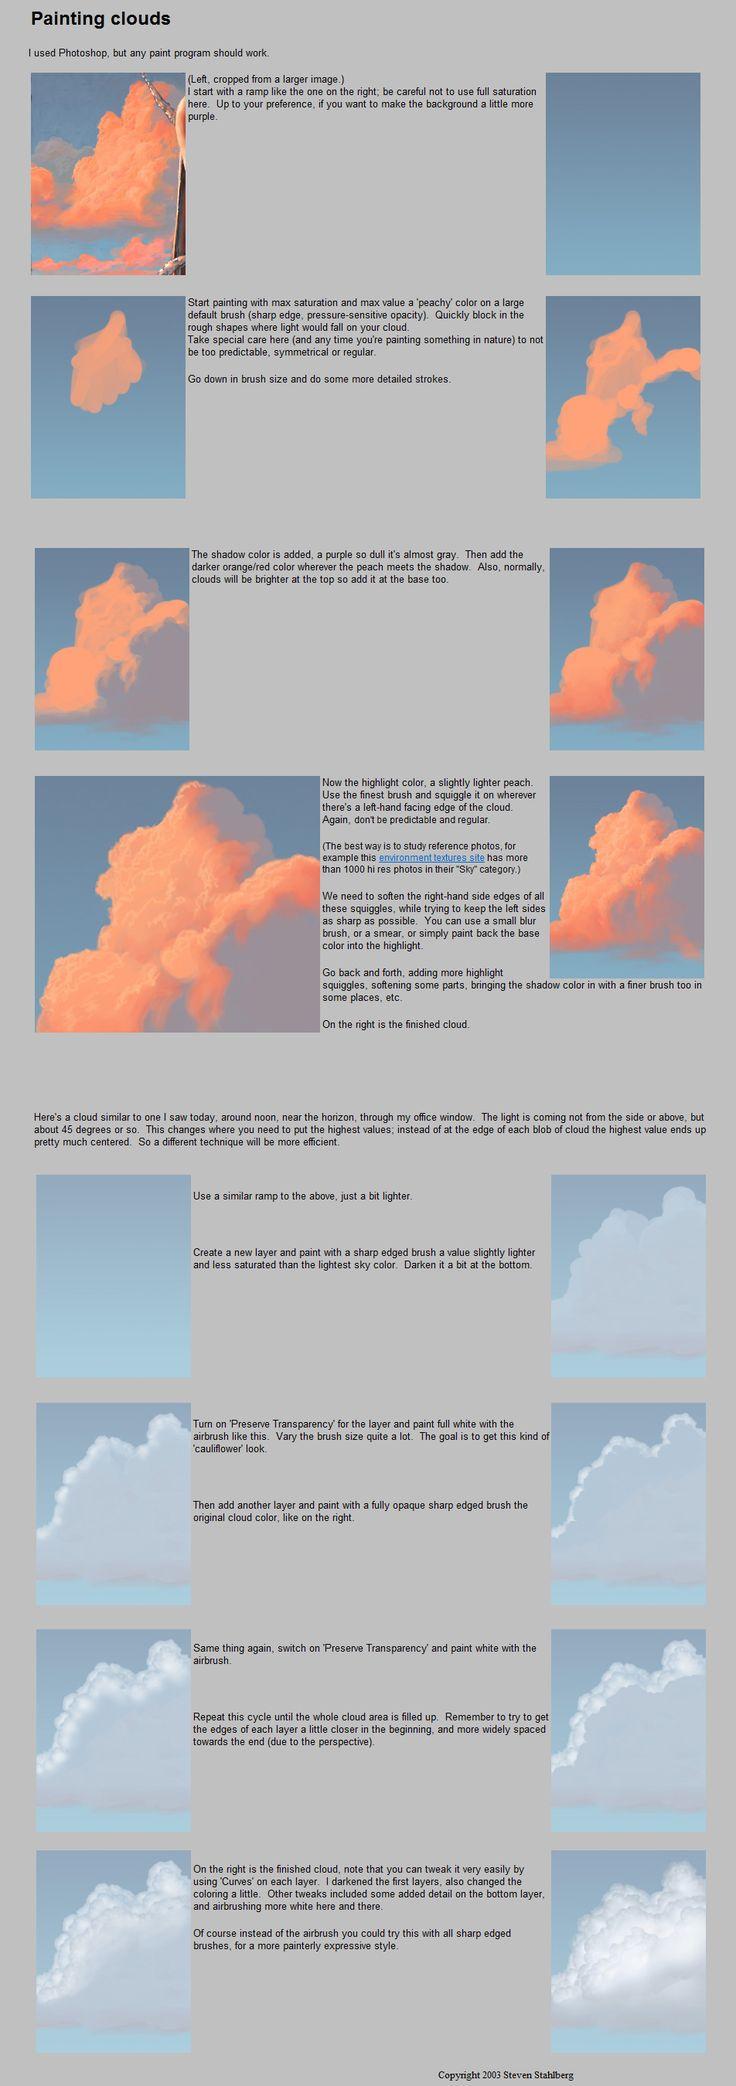 17 Best ideas about Cloud Art on Pinterest.